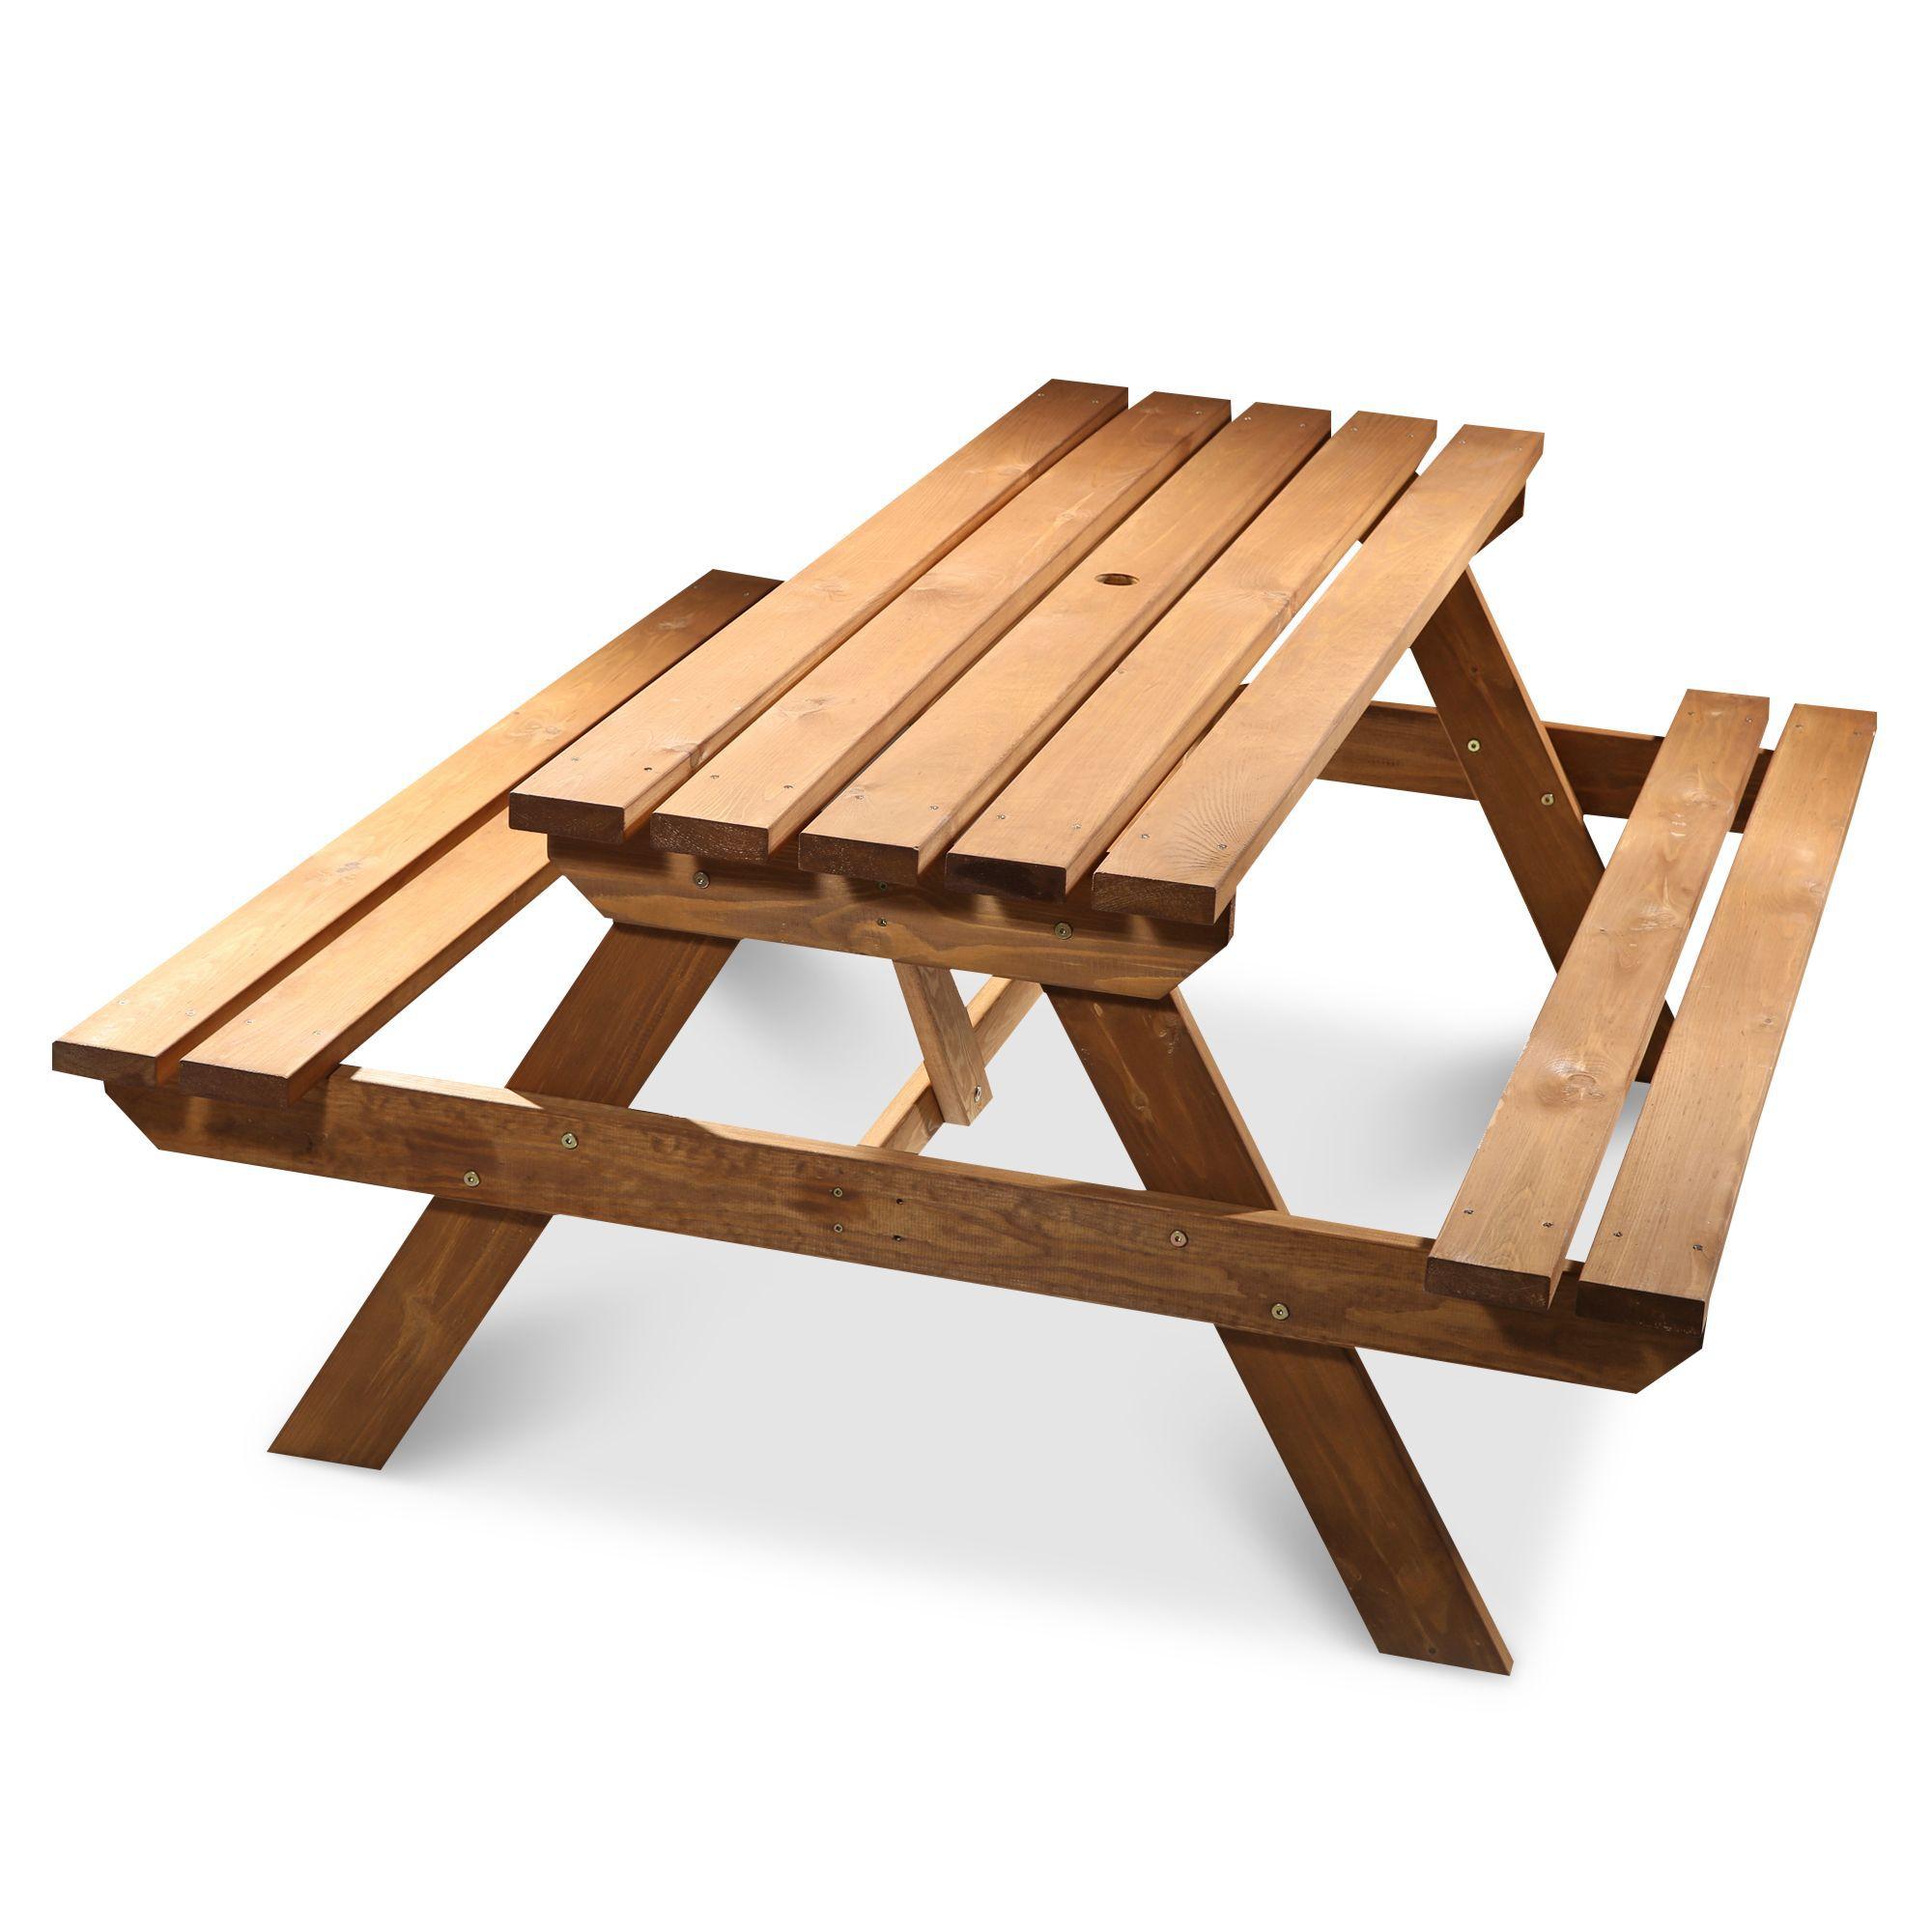 agad wooden picnic bench